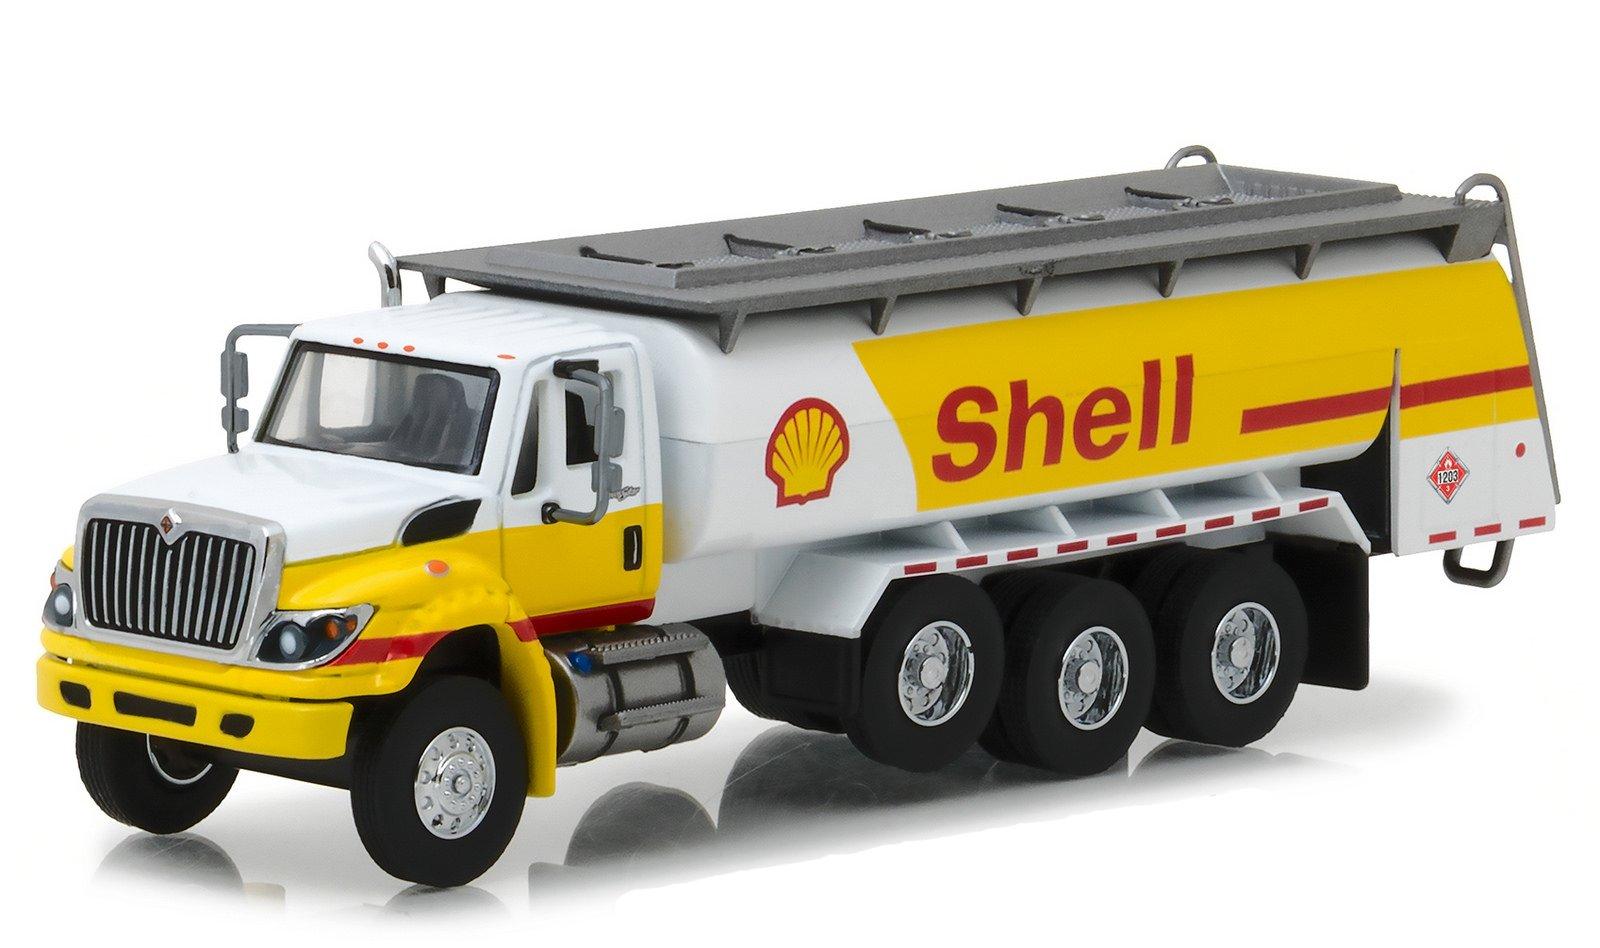 Cheap Emek Model Trucks Find Deals On Line At 1968 Chevy Truck 50th Anniversary Get Quotations 2017 International Workstar Tanker Shell Oil Sd Series 2 1 64 Diecast